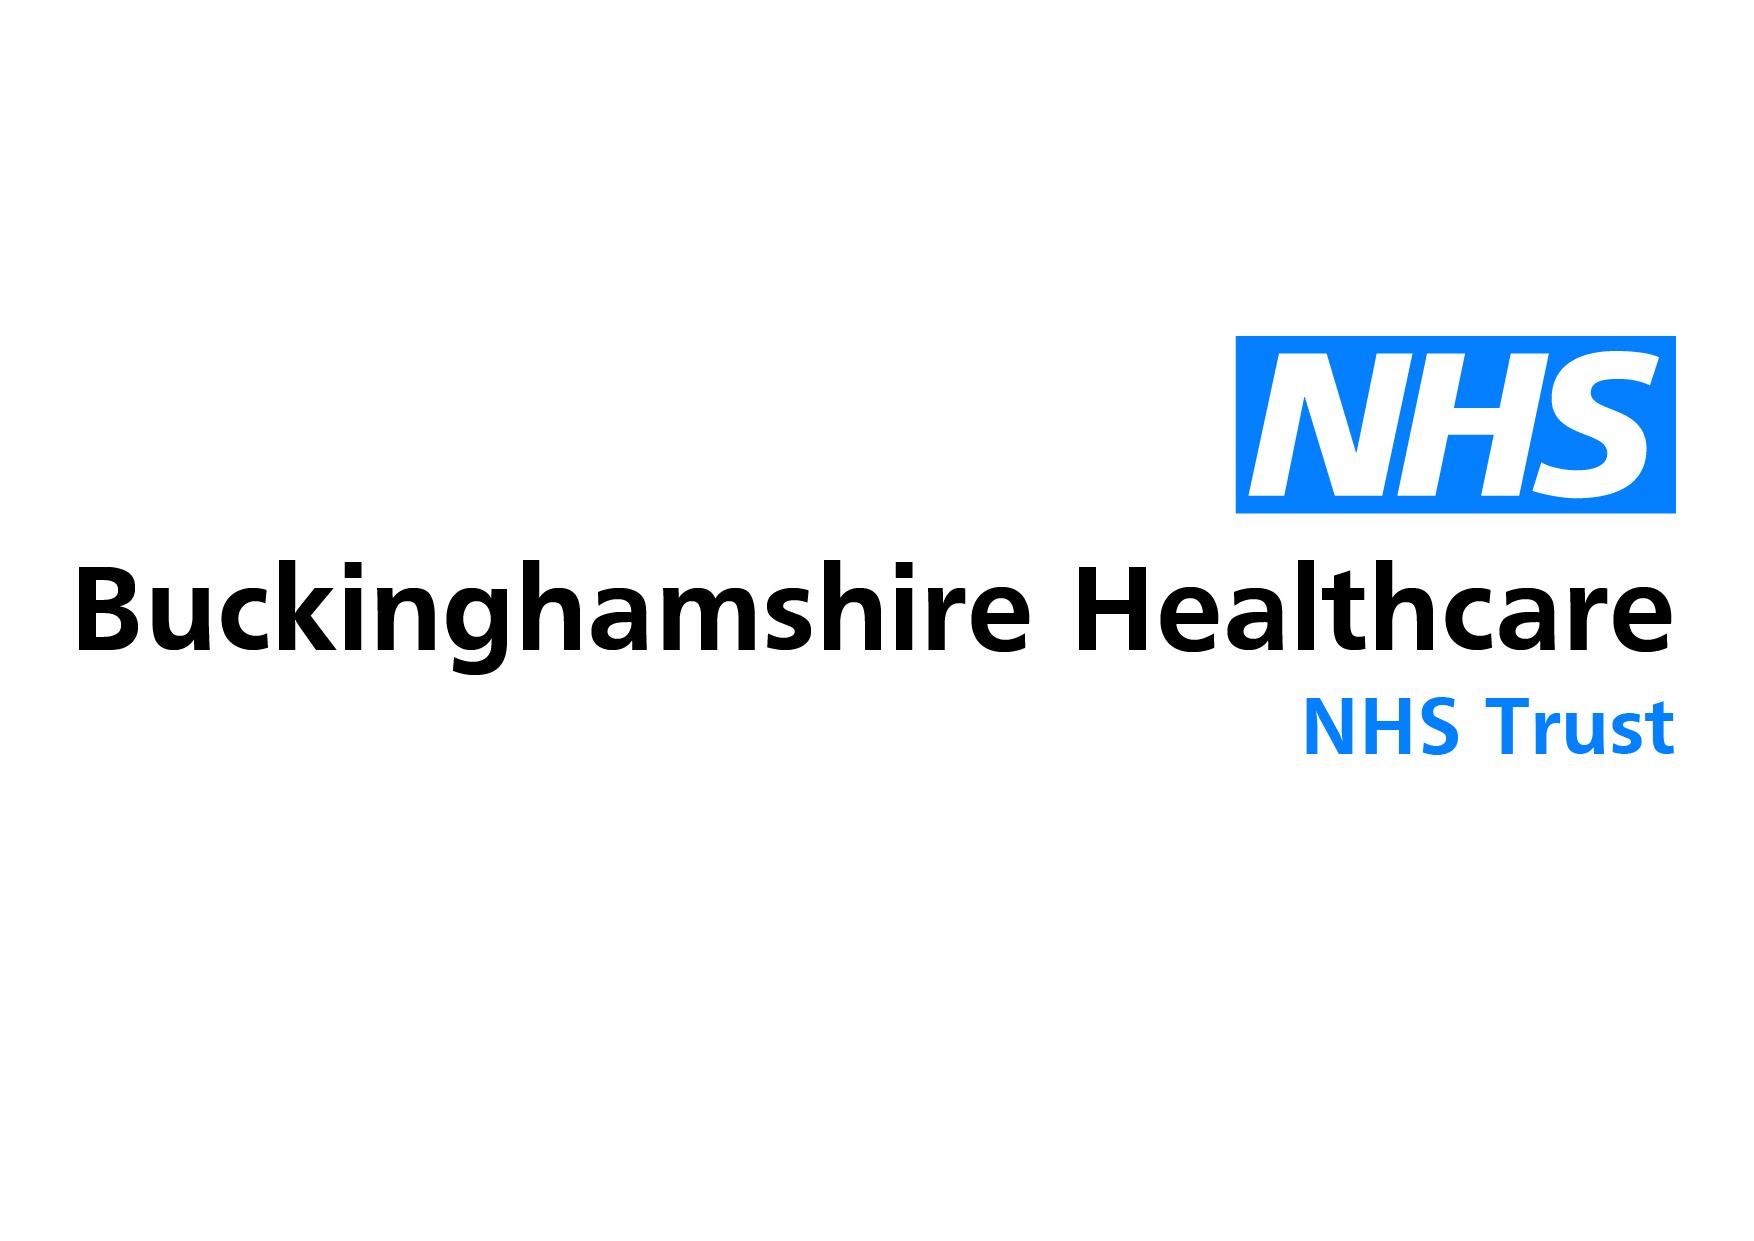 Buckinghamshire Healthcare NHS Logo